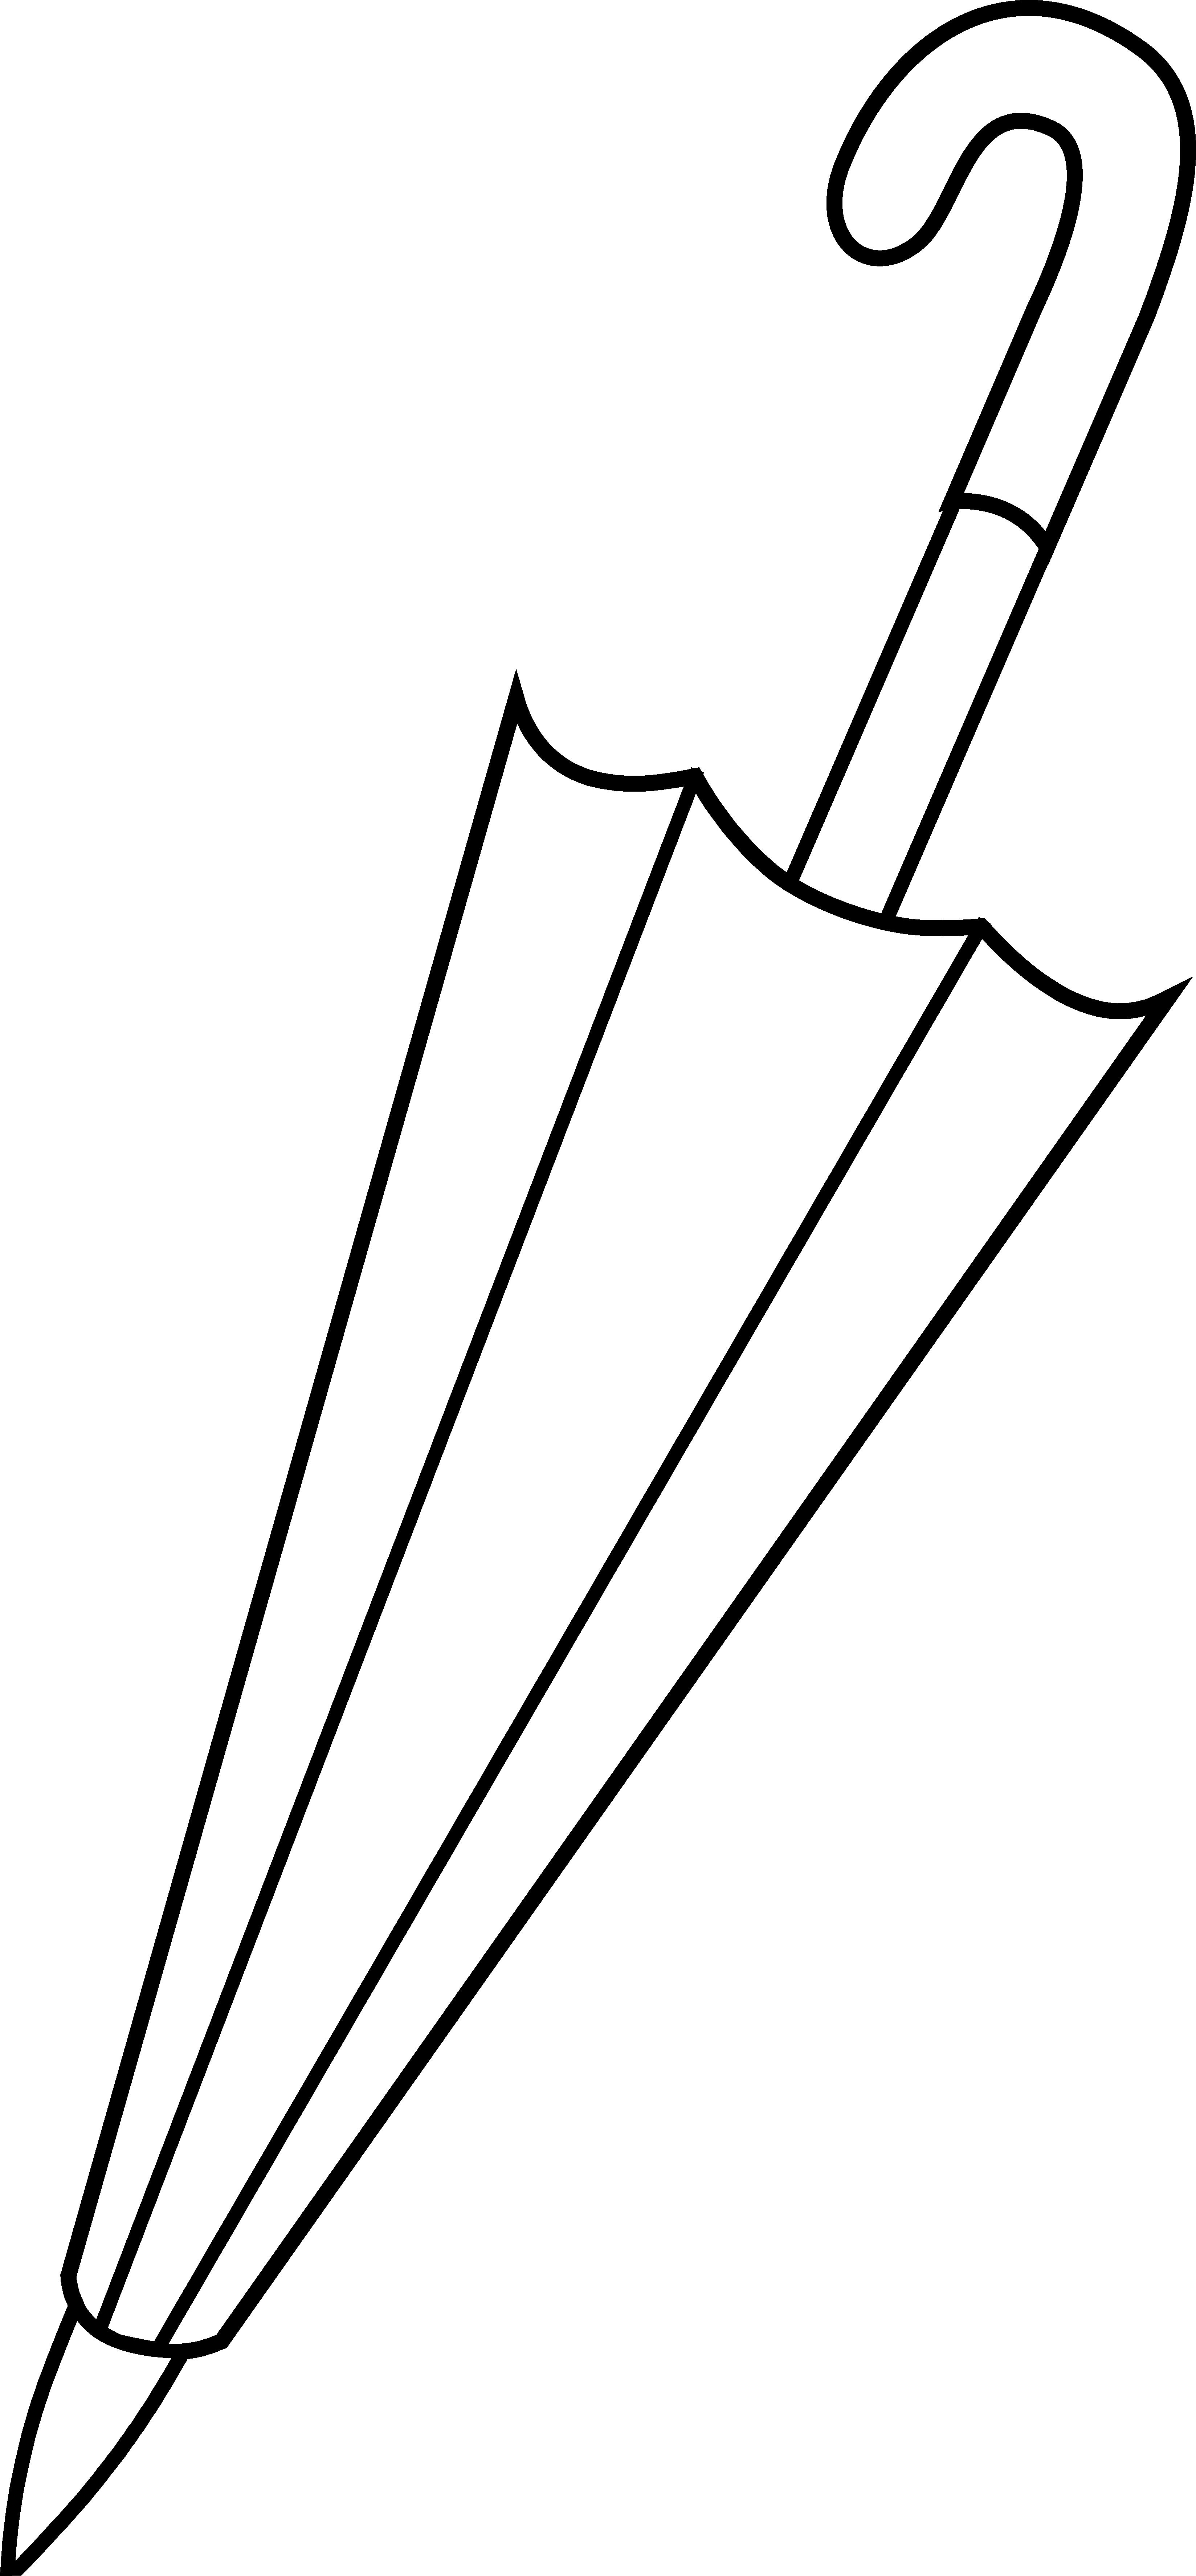 Line Art Umbrella : Beach umbrella clipart black and white panda